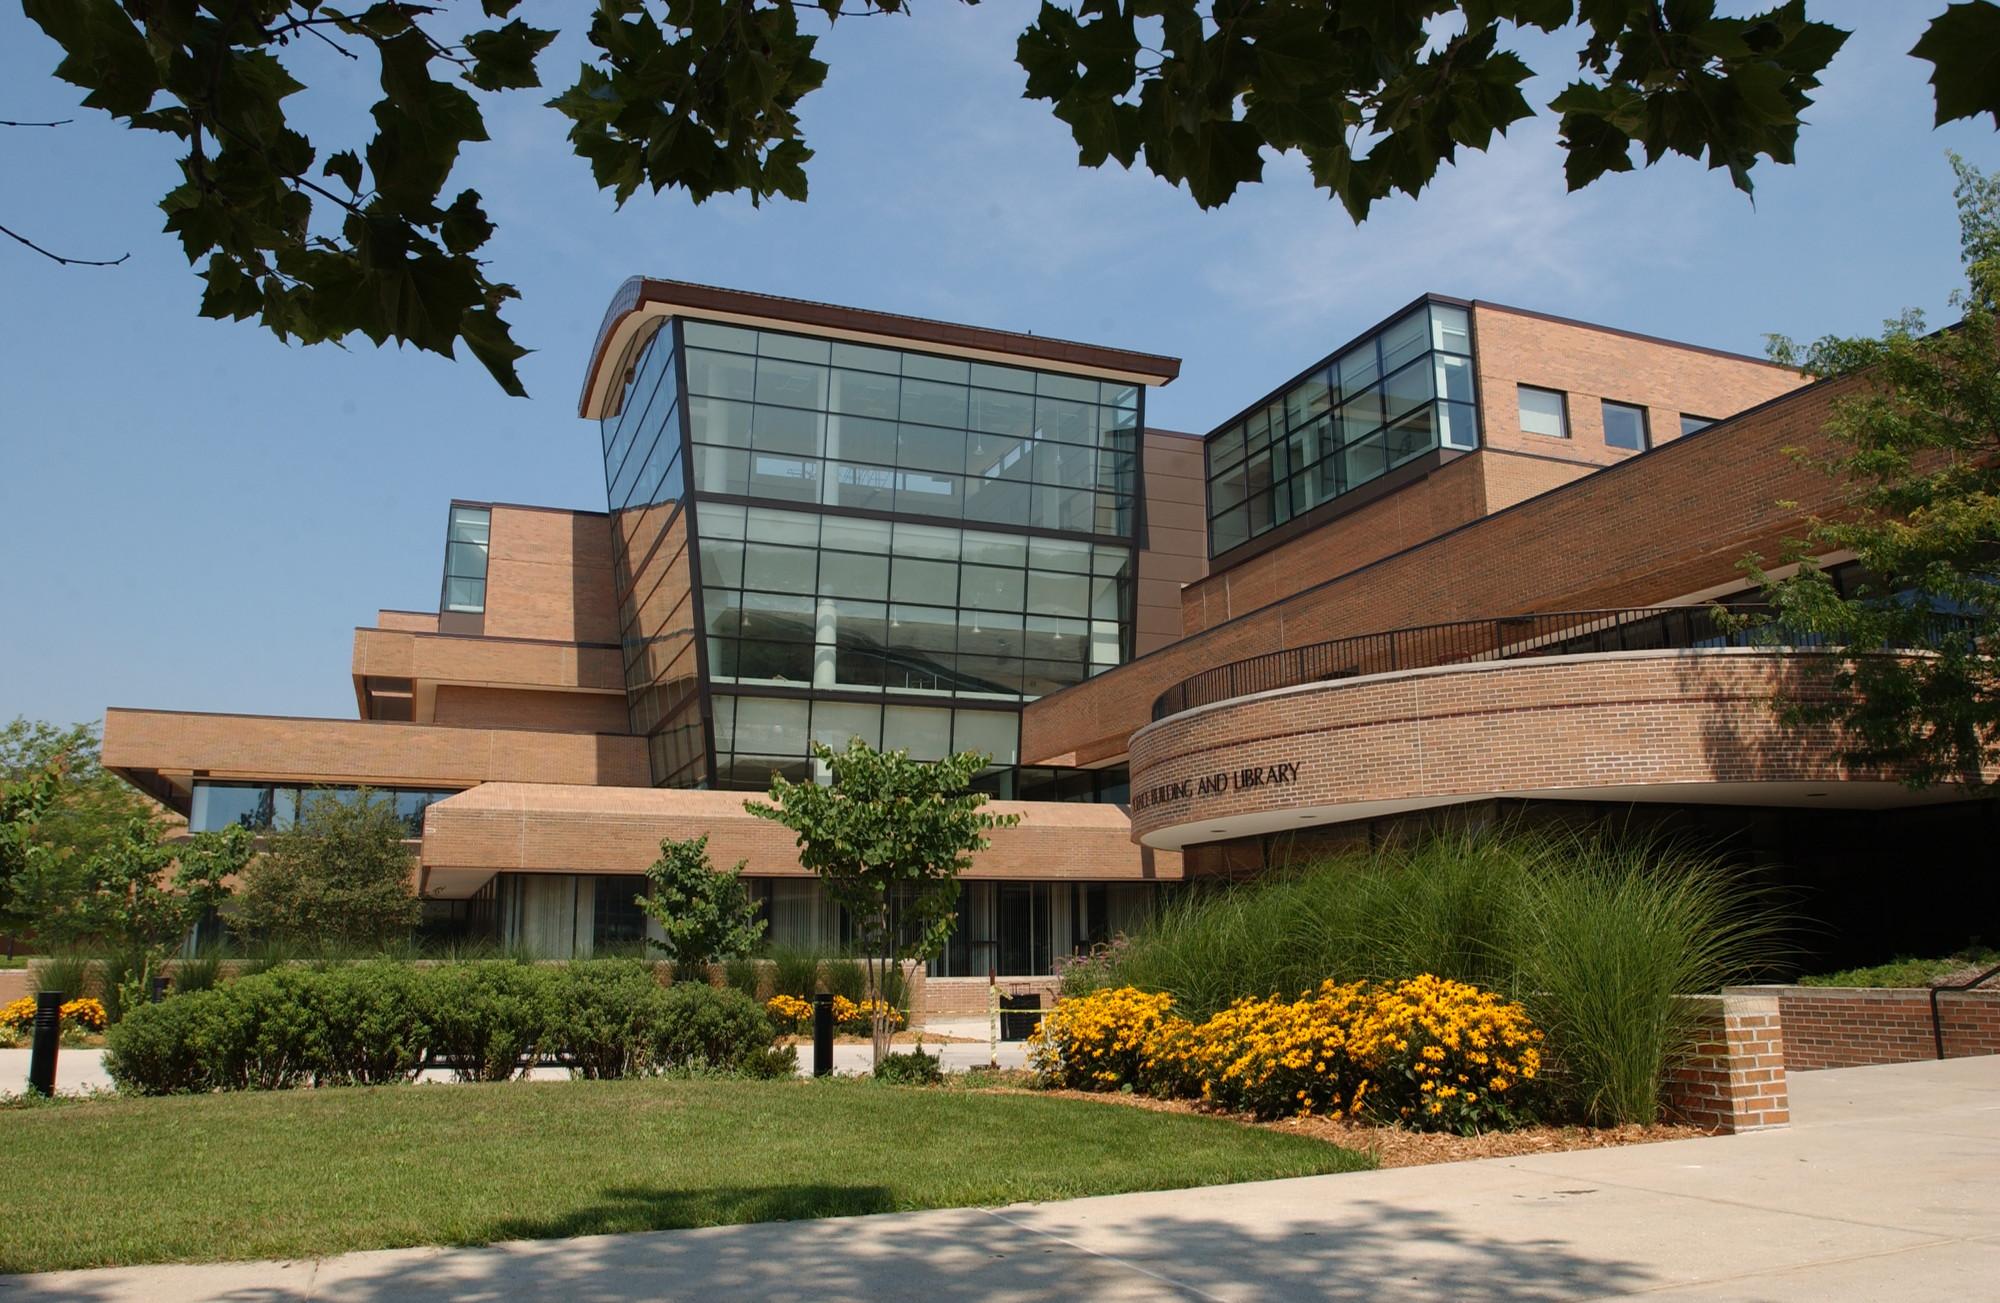 Zahnow Library Exterior